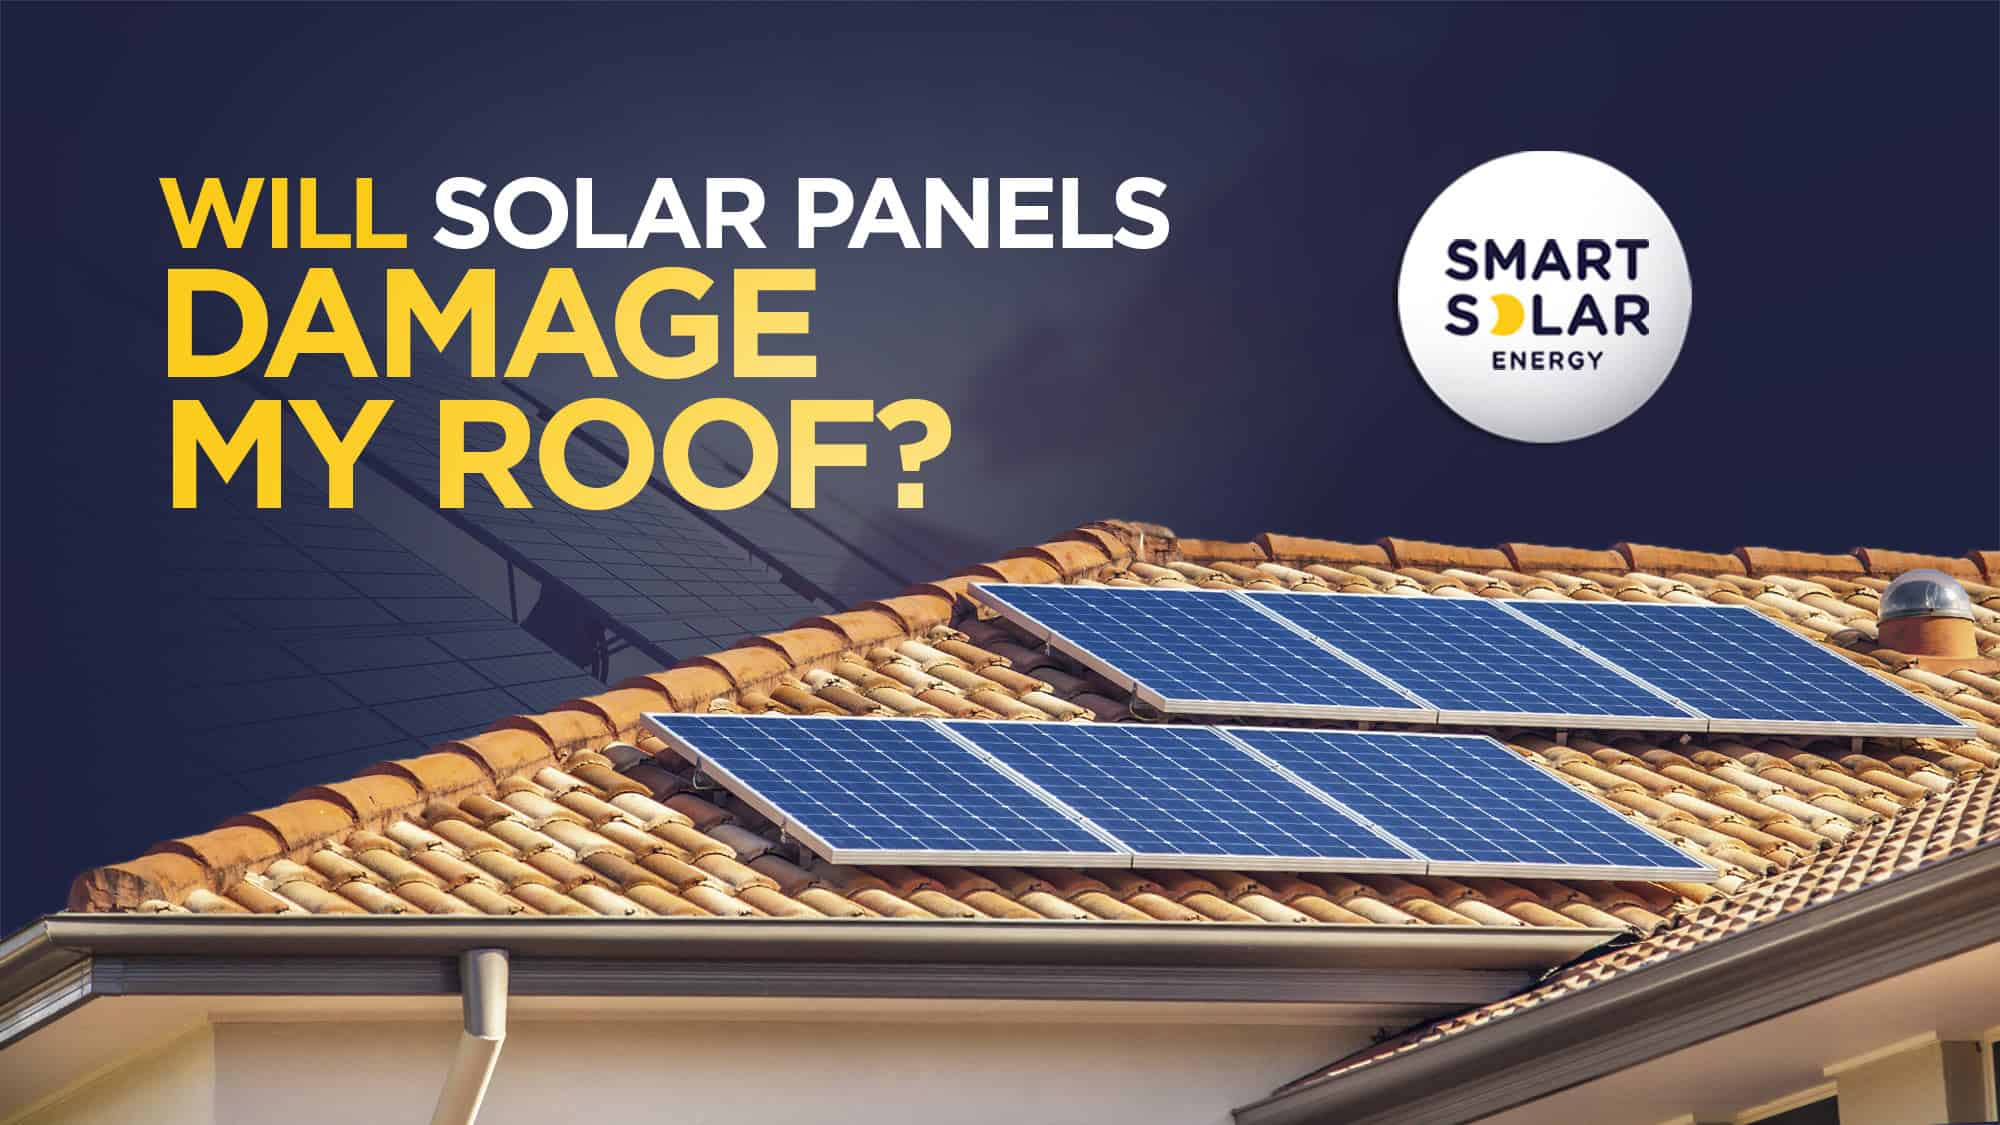 Will solar panels damage my roof?